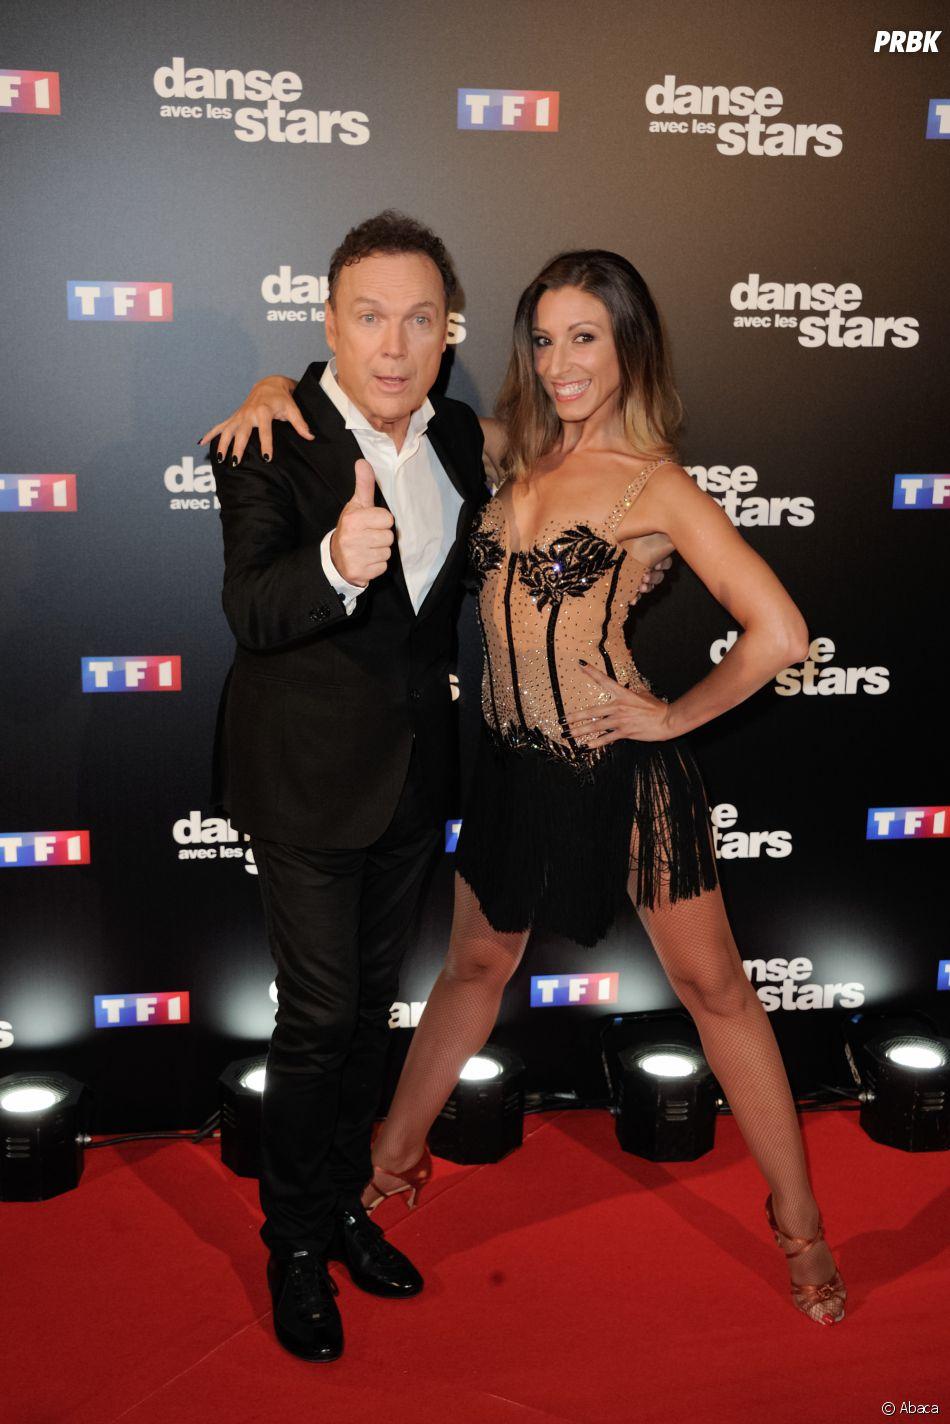 Julien Lepers dansera avec Silvia Notargiacomo dans Danse avec les stars 7.